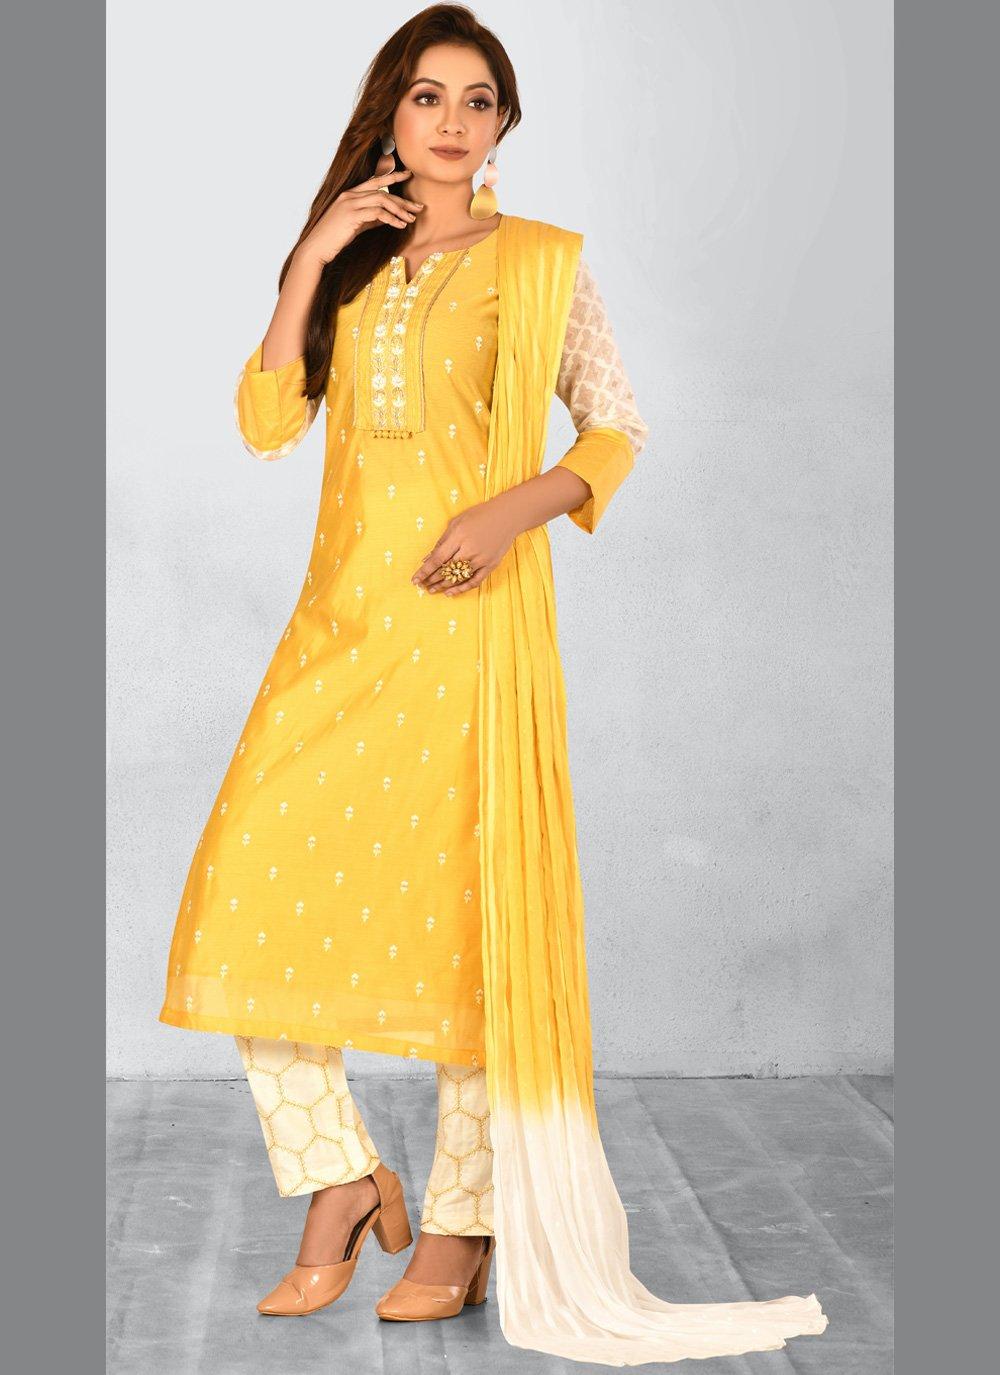 Chanderi Embroidered Trendy Salwar Kameez in Yellow